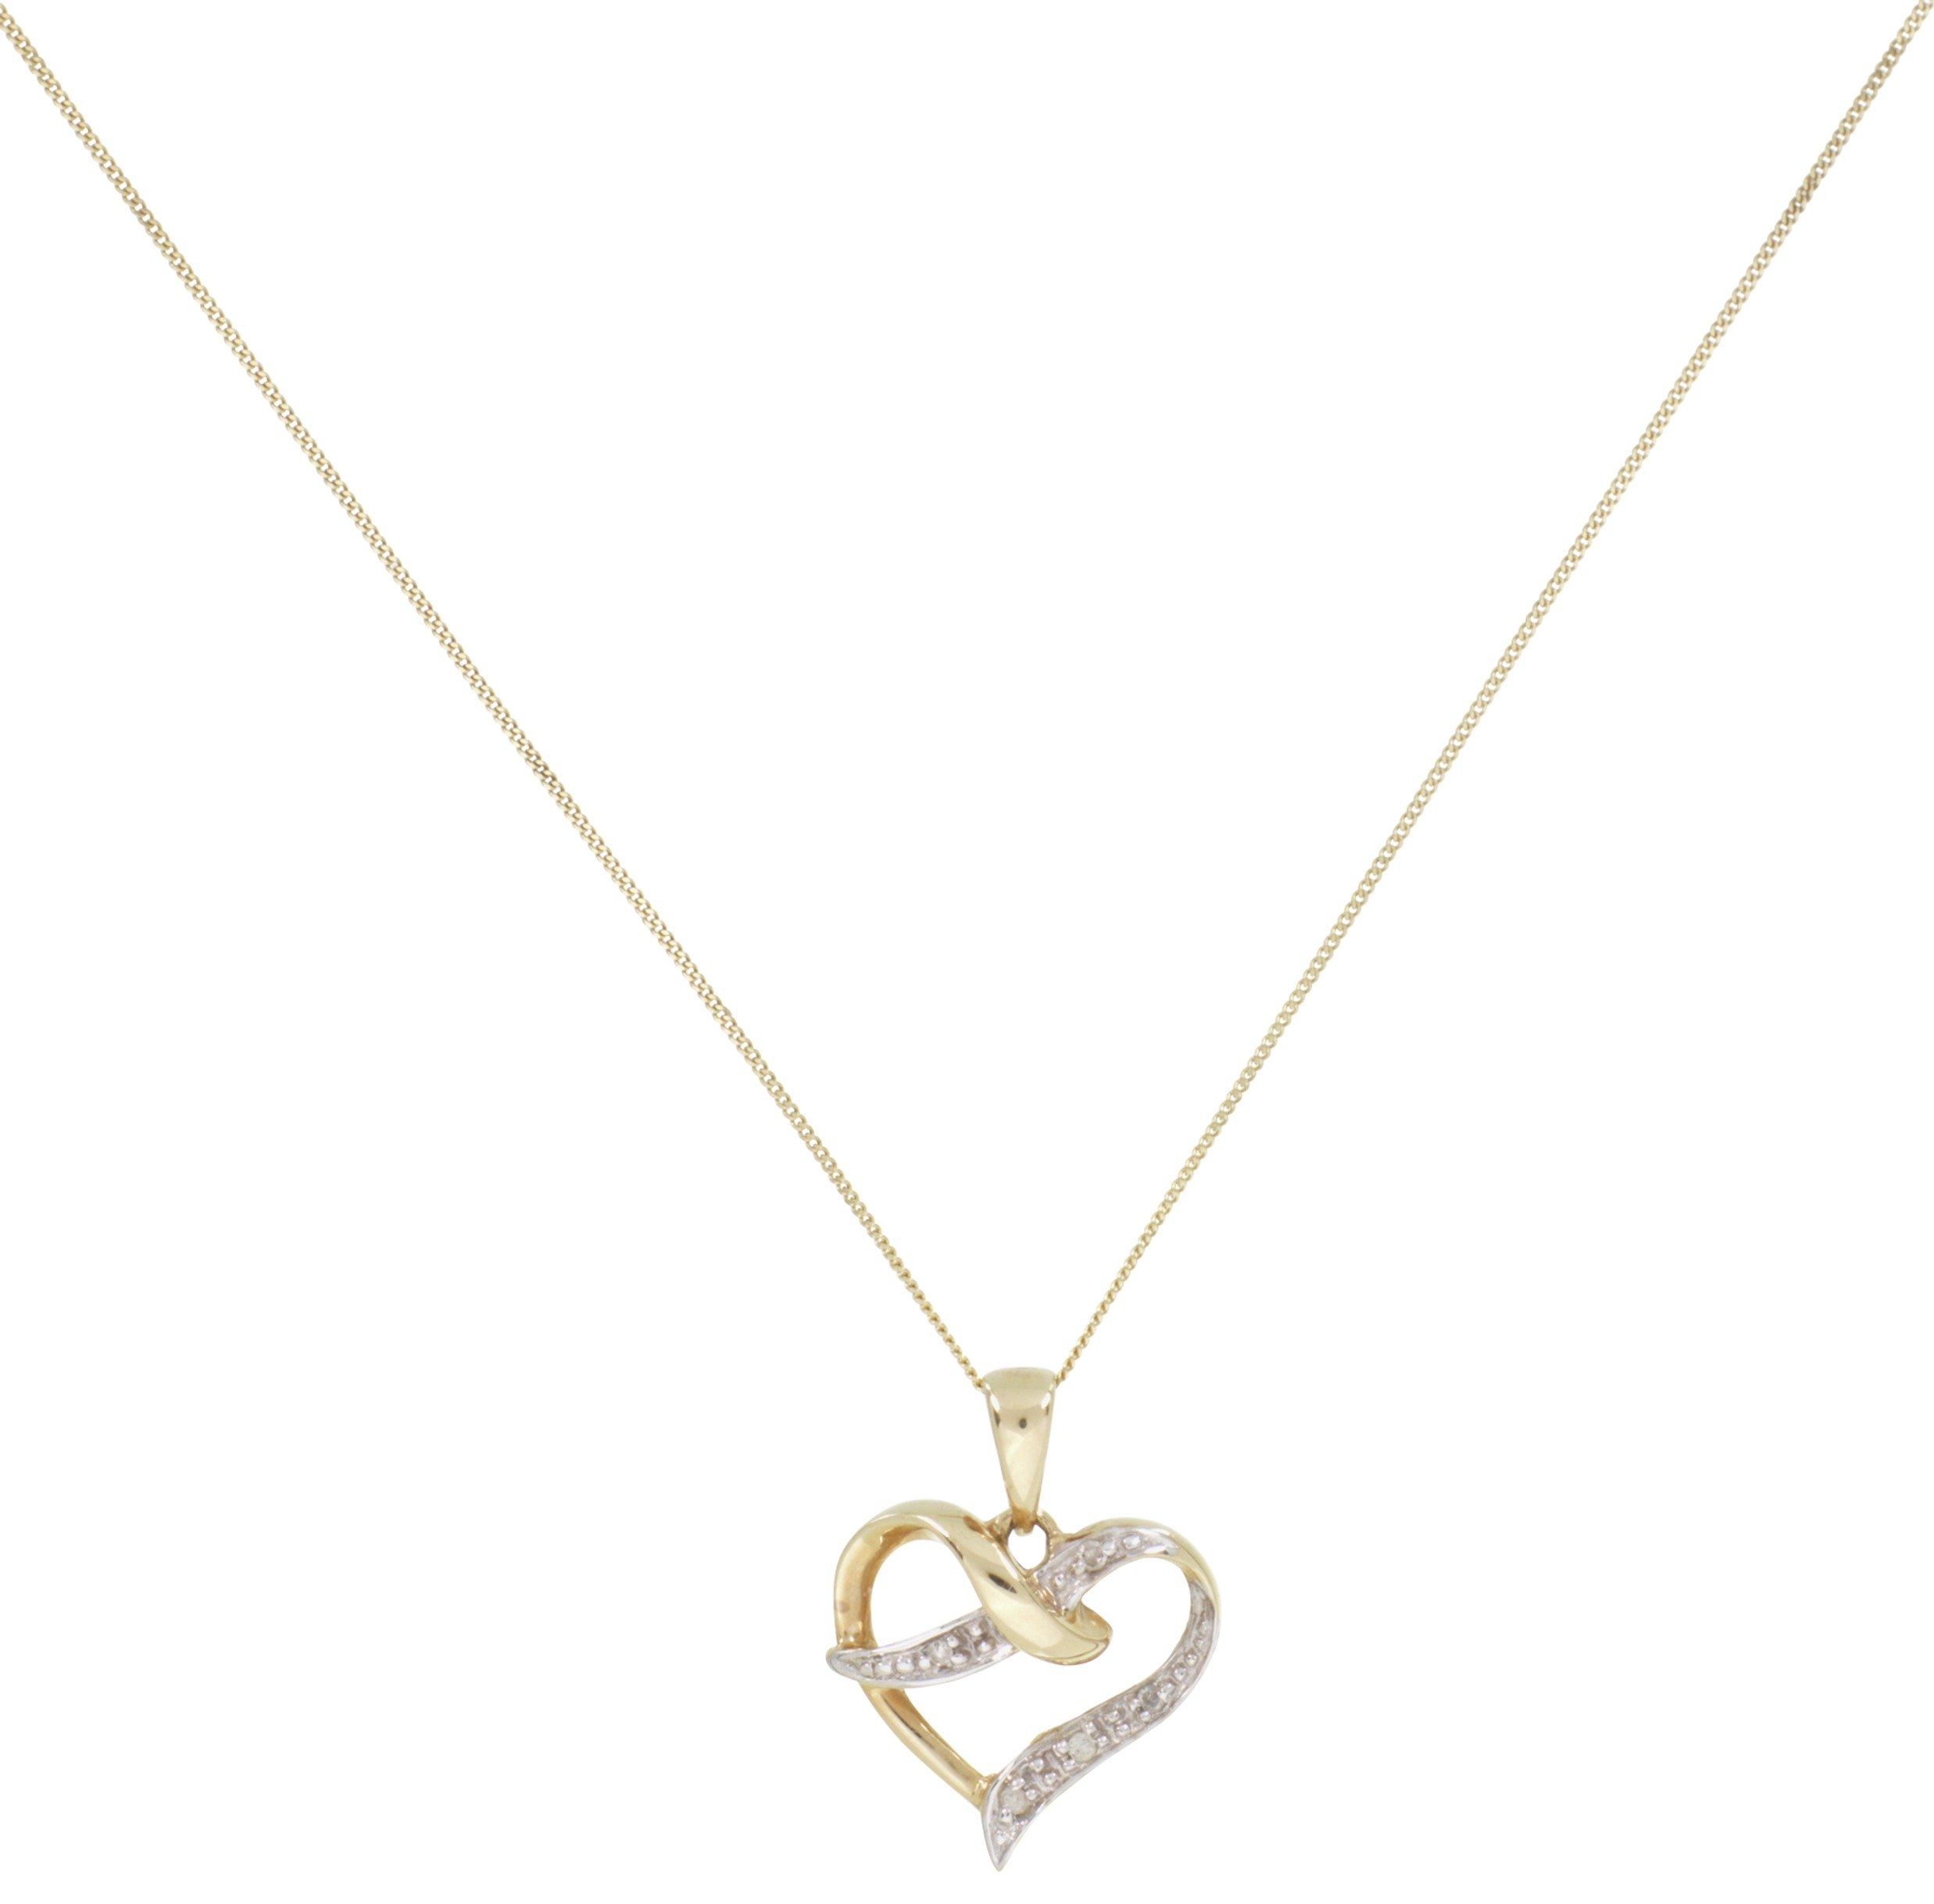 9 Carat Gold - Diamond Accent Heart Pendant.